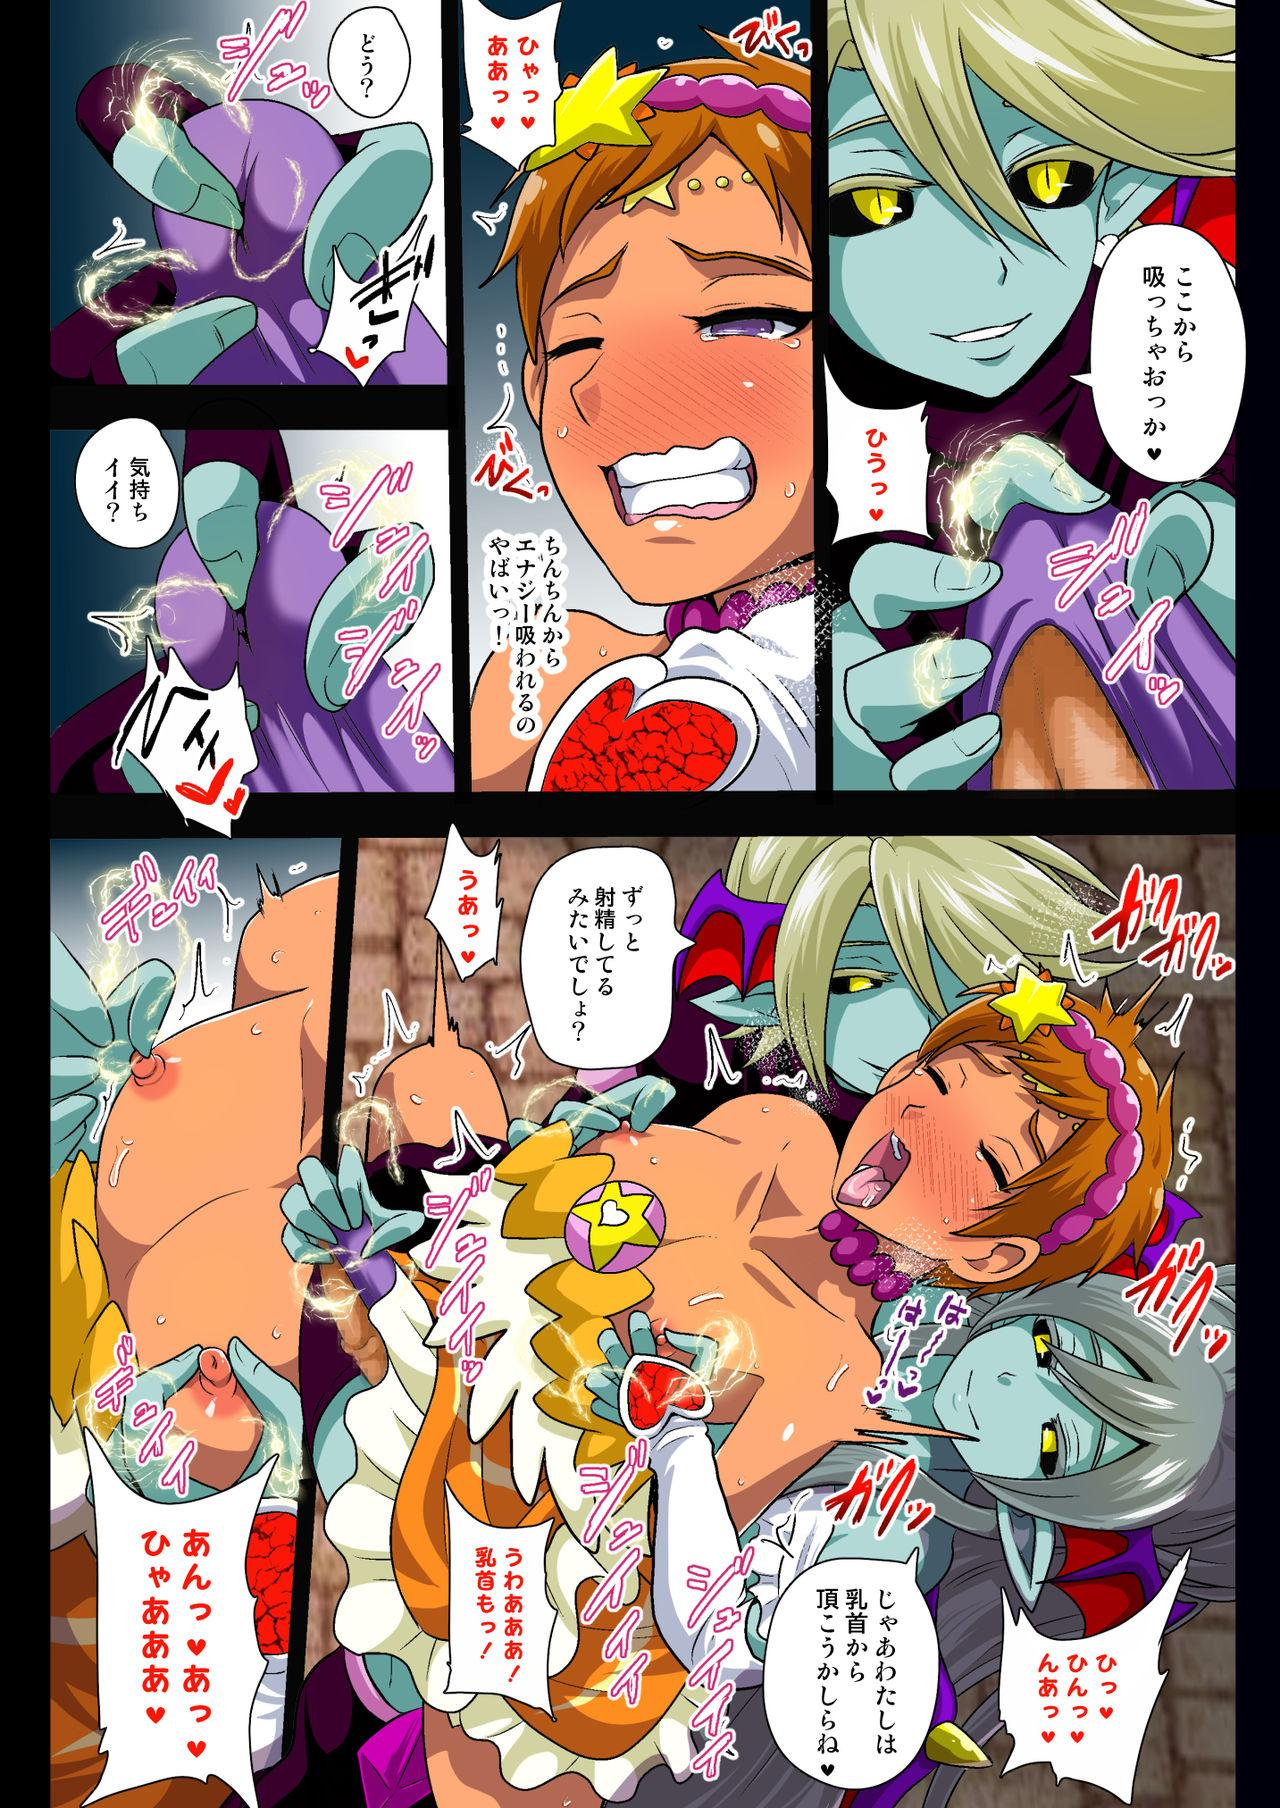 Preccubus v.s. Shota Cure 6